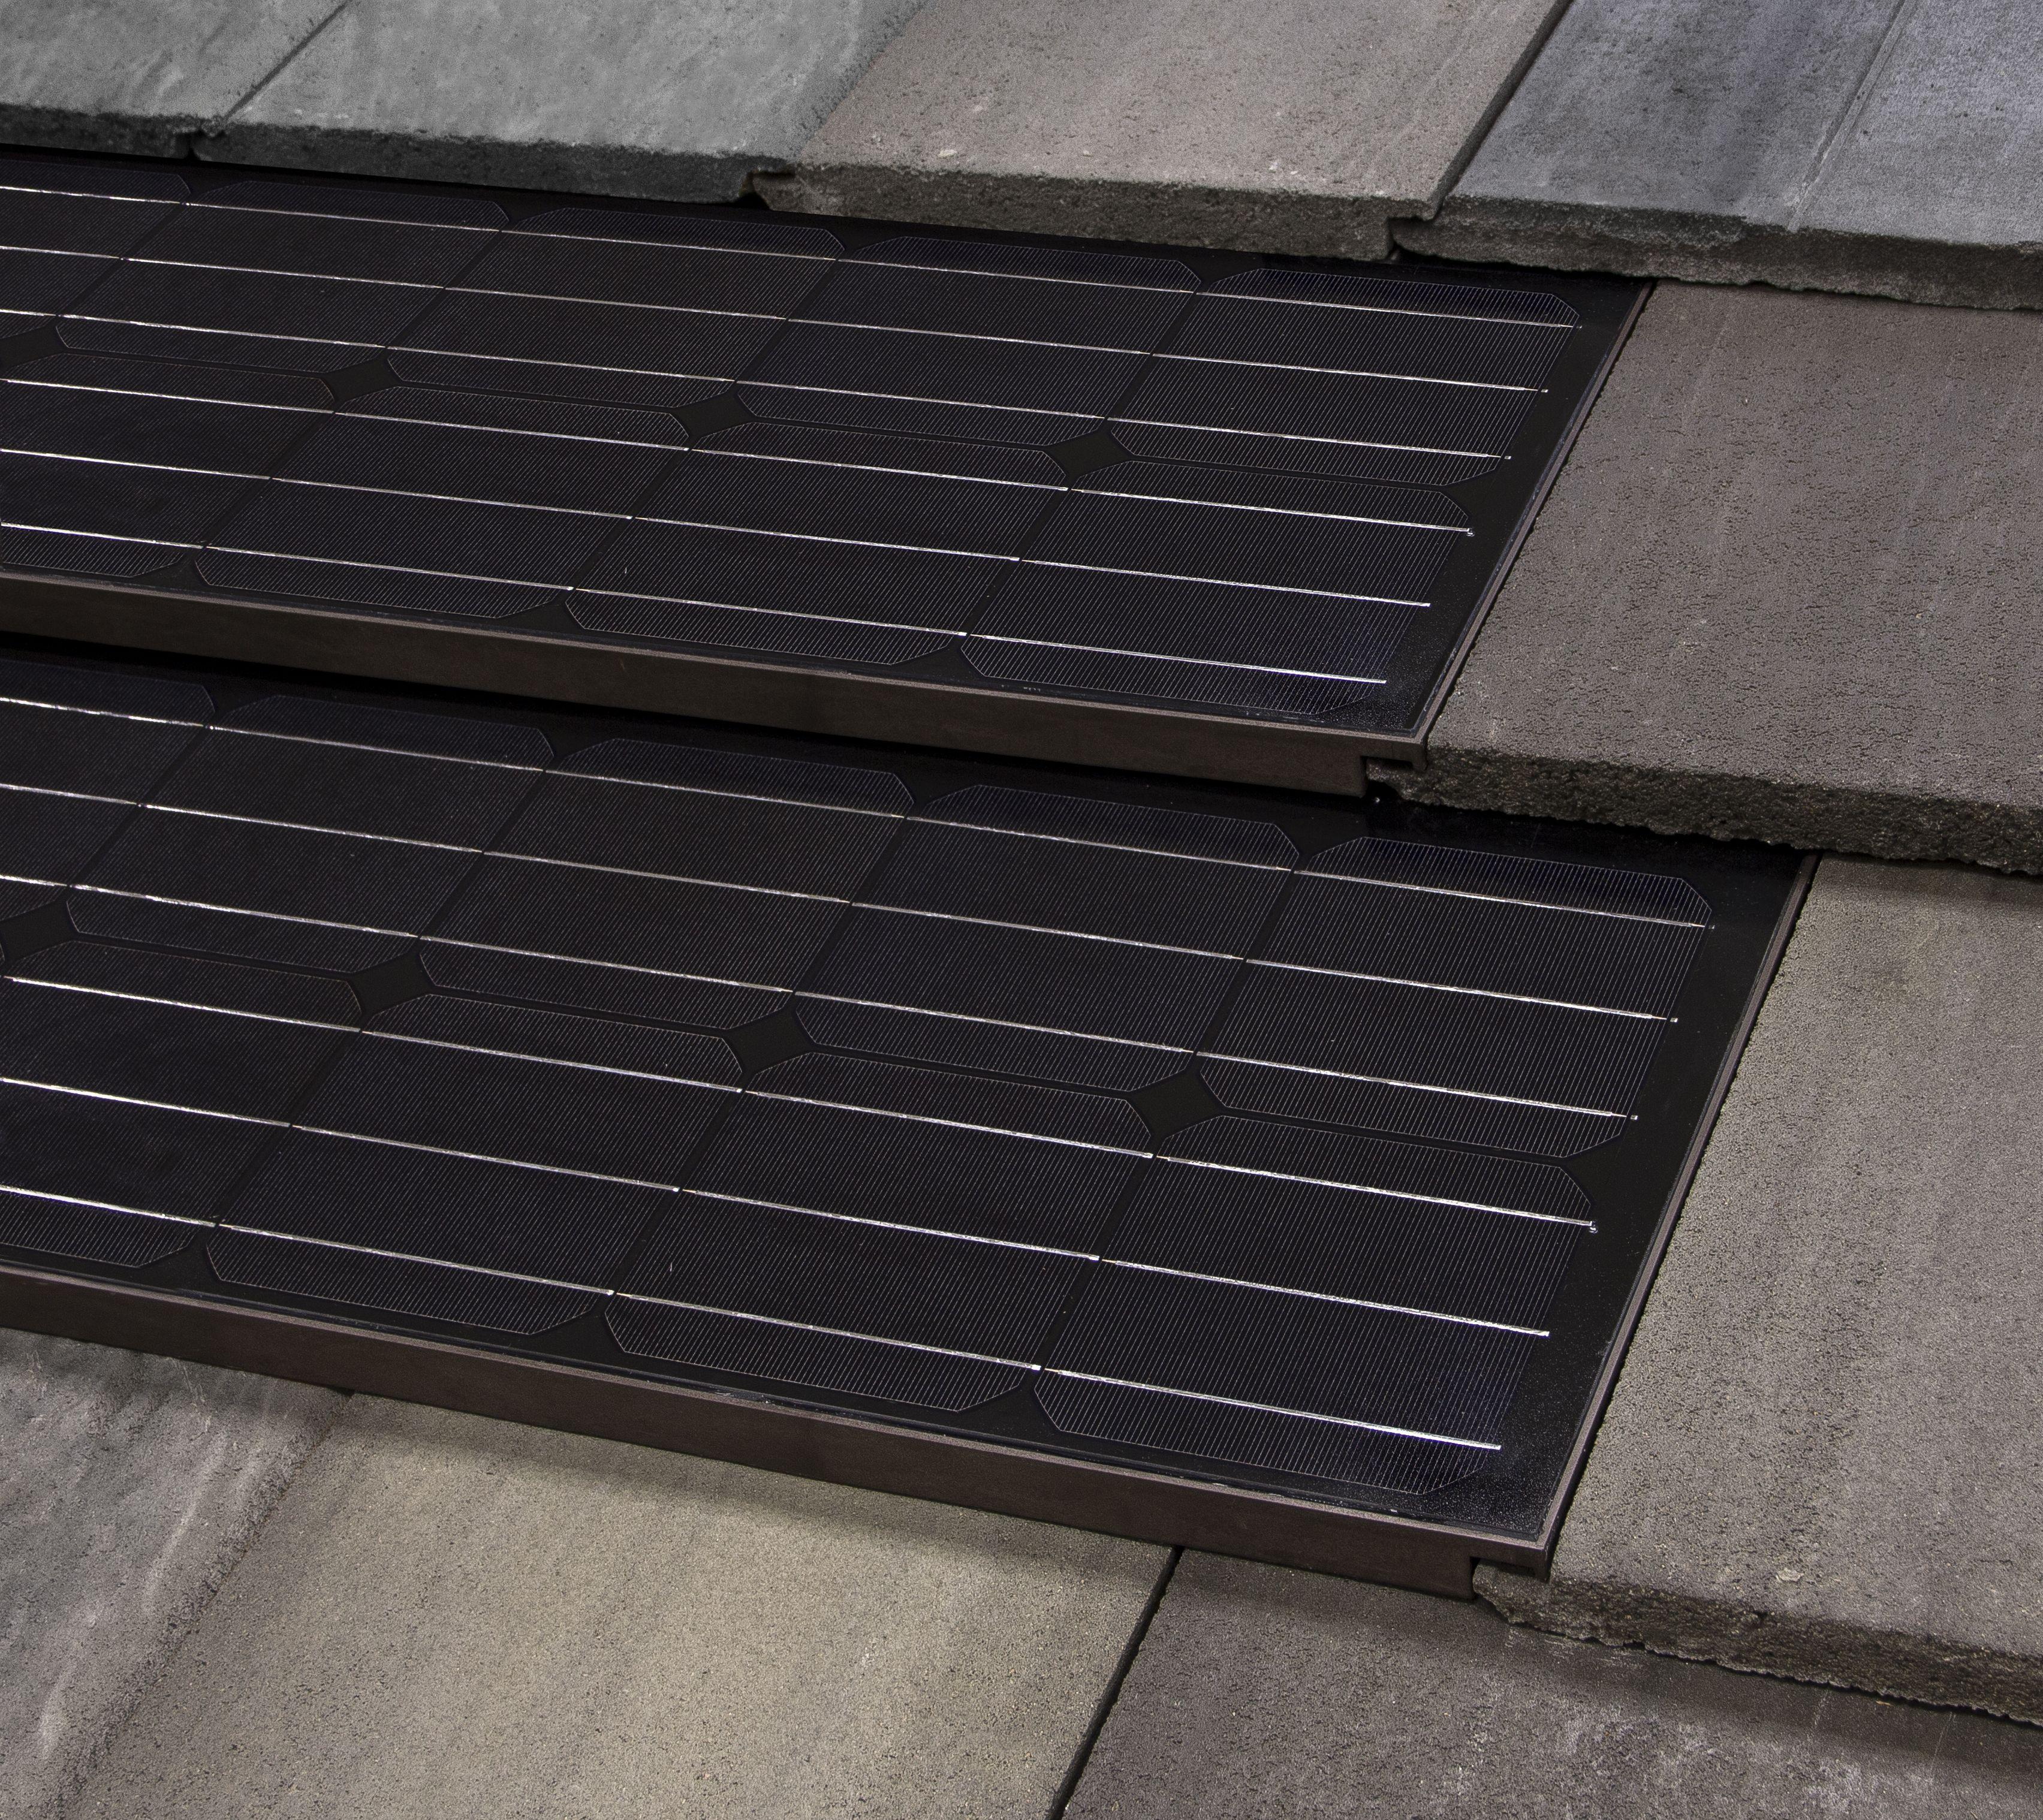 Apollo Ii Solar Roofing Systems From Certainteed Corporation Solar Solar Panel Cost Diy Solar Panel